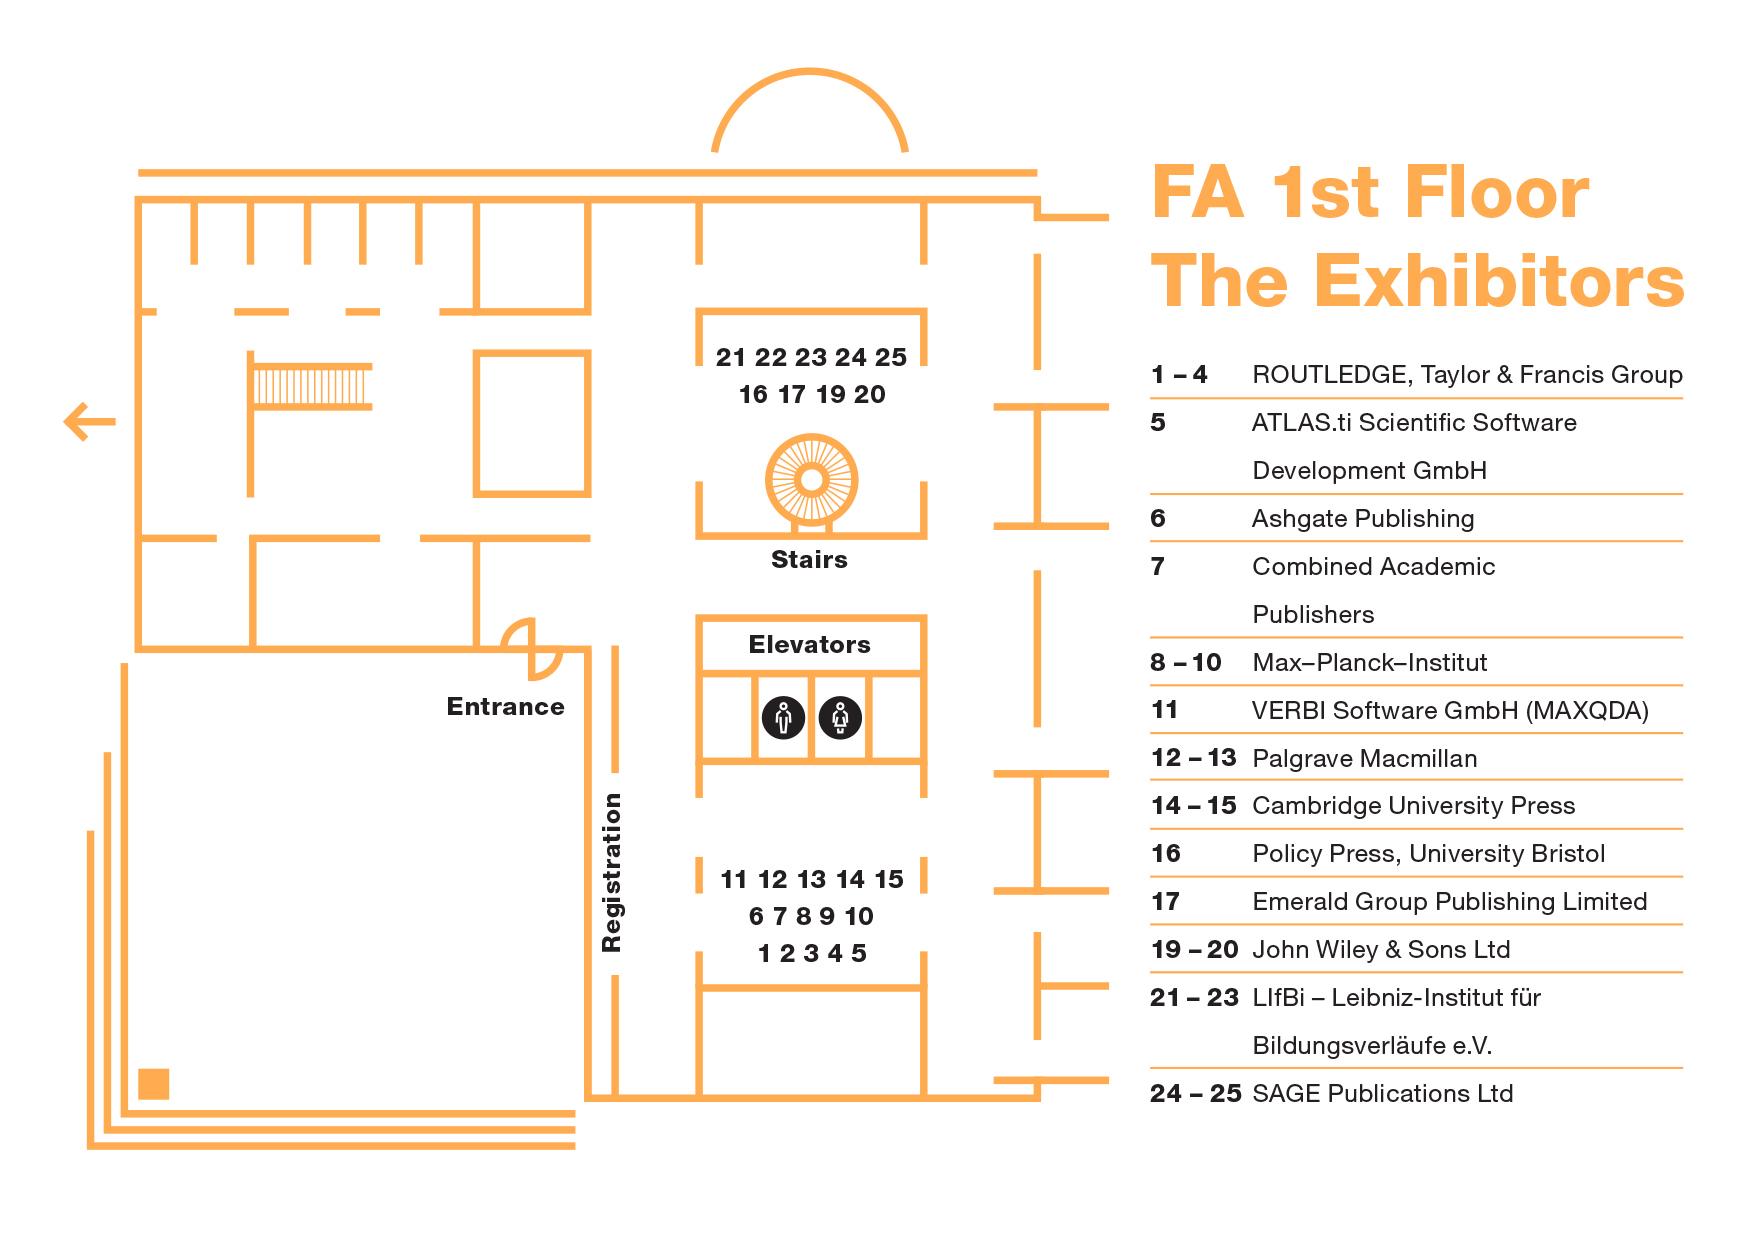 FA - 1st floor - exhibitors